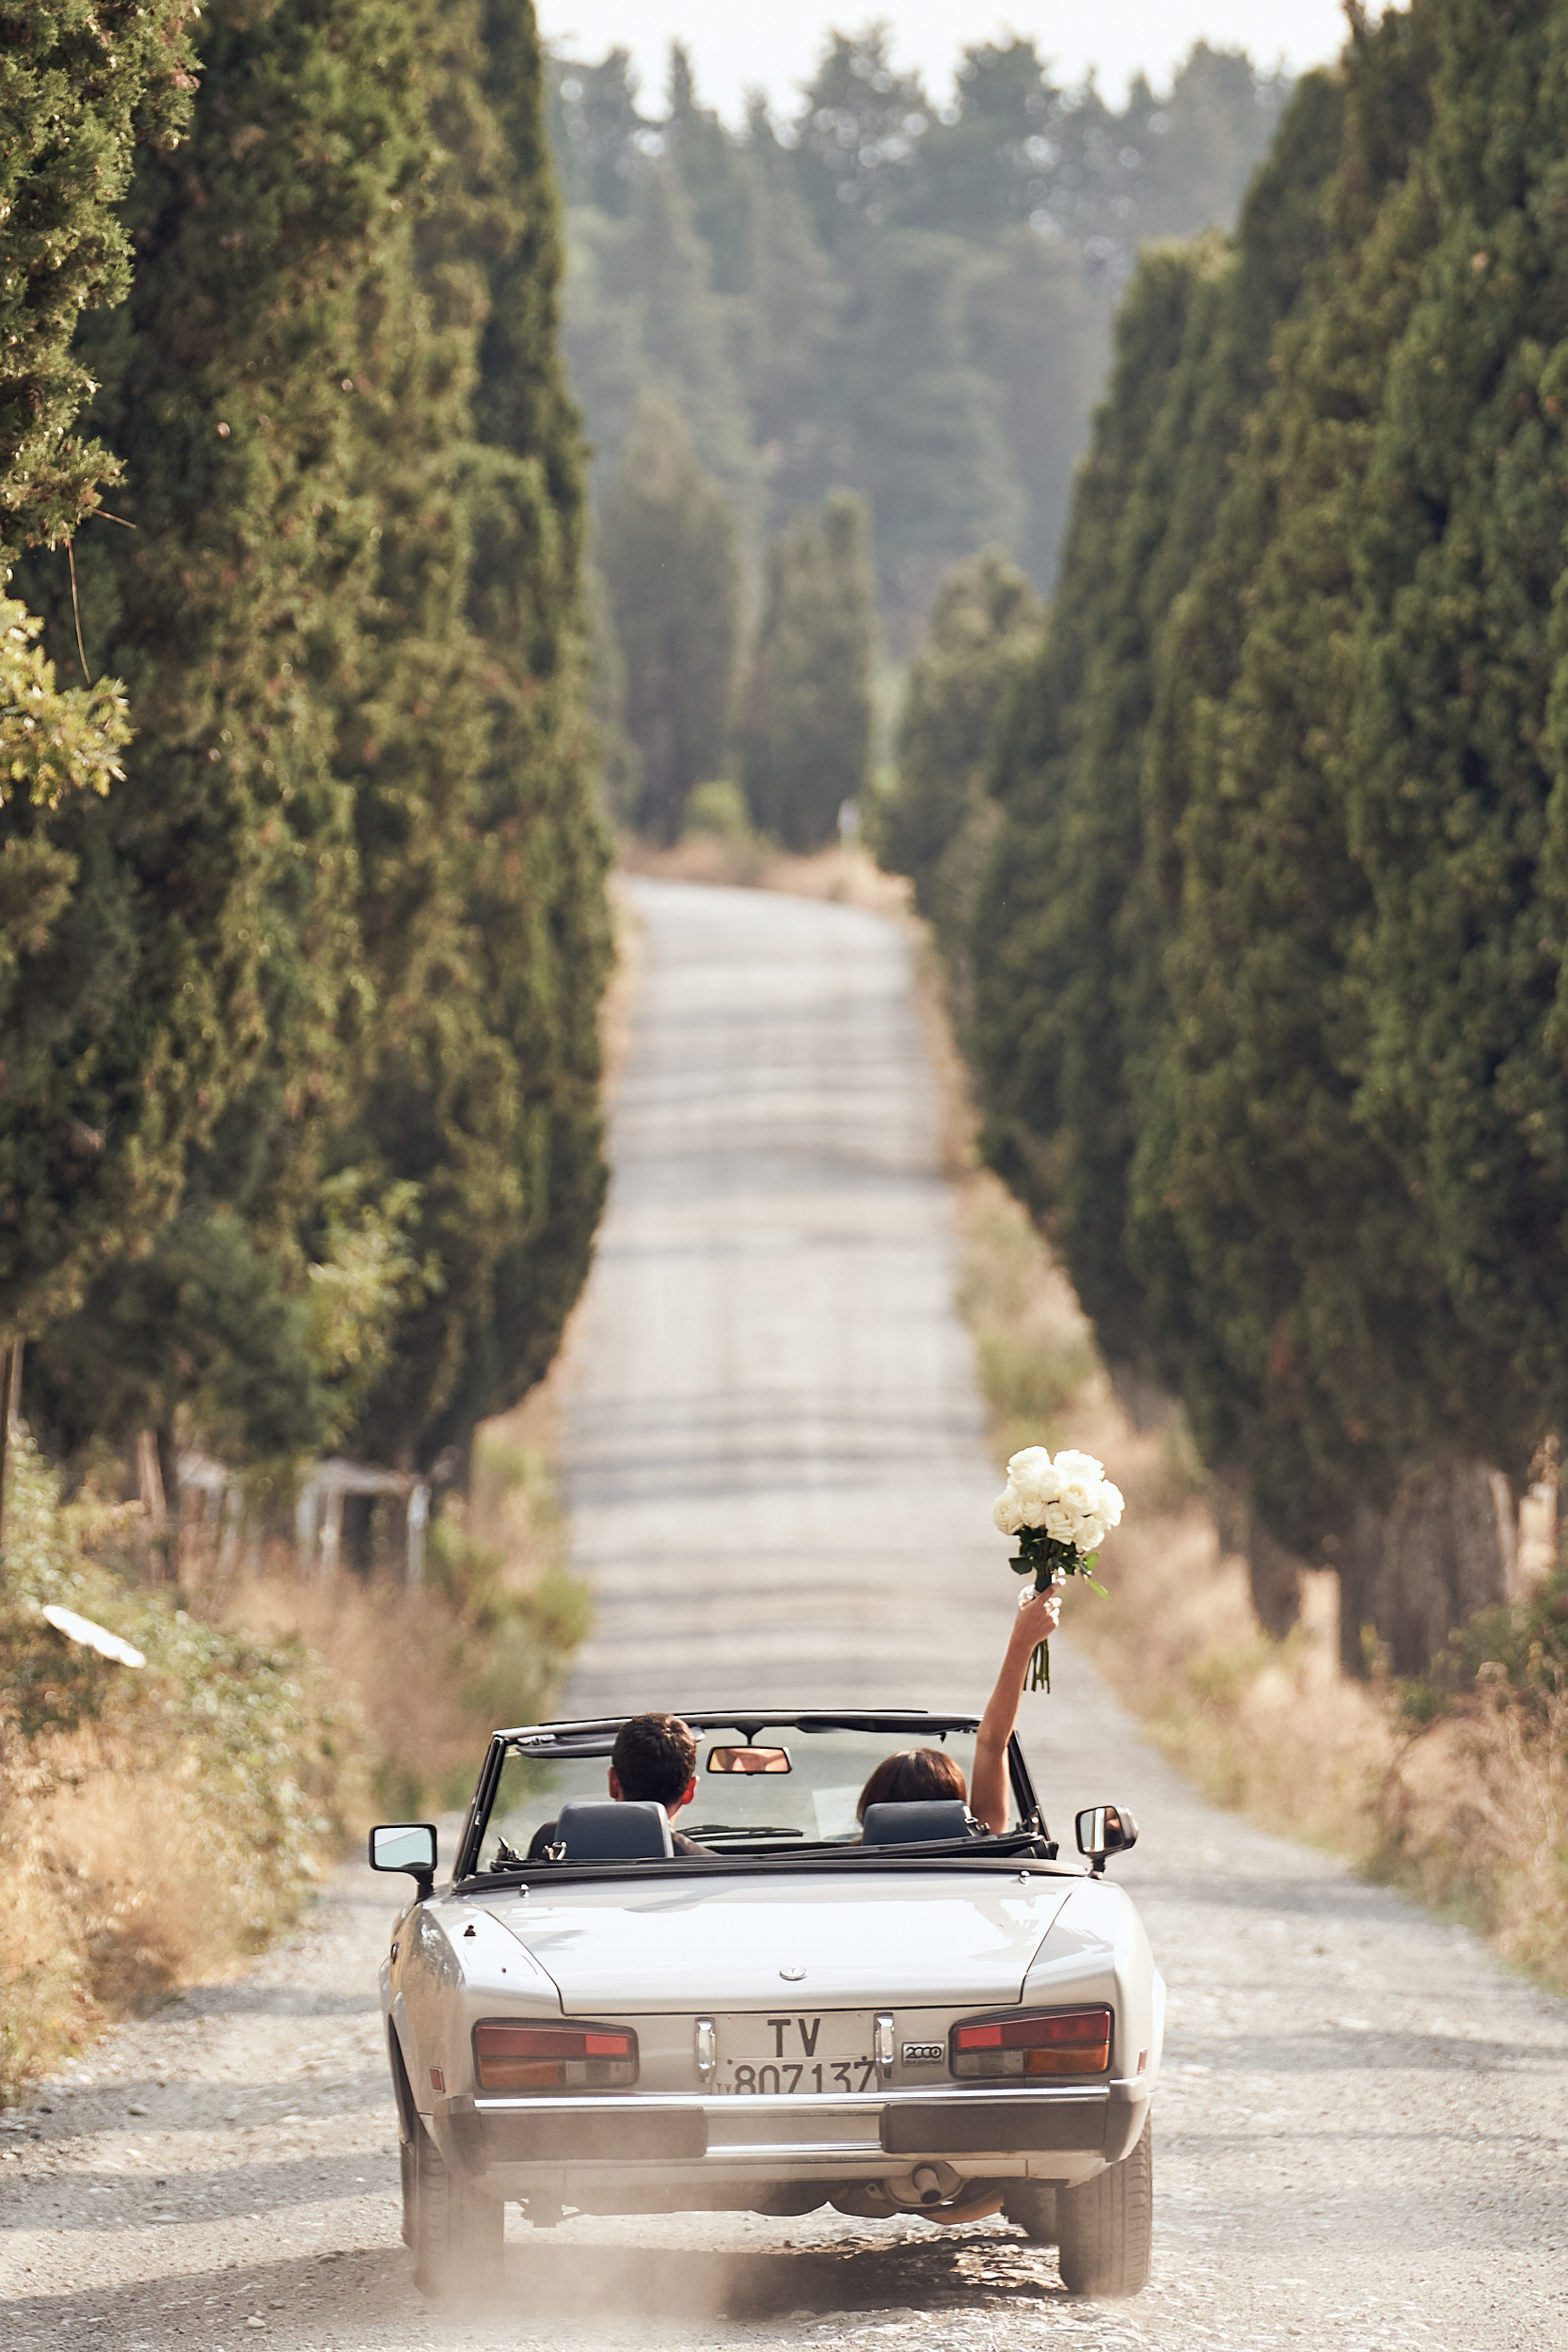 LR_JandA_Tuscanywedding_lostinlove 50.jpg